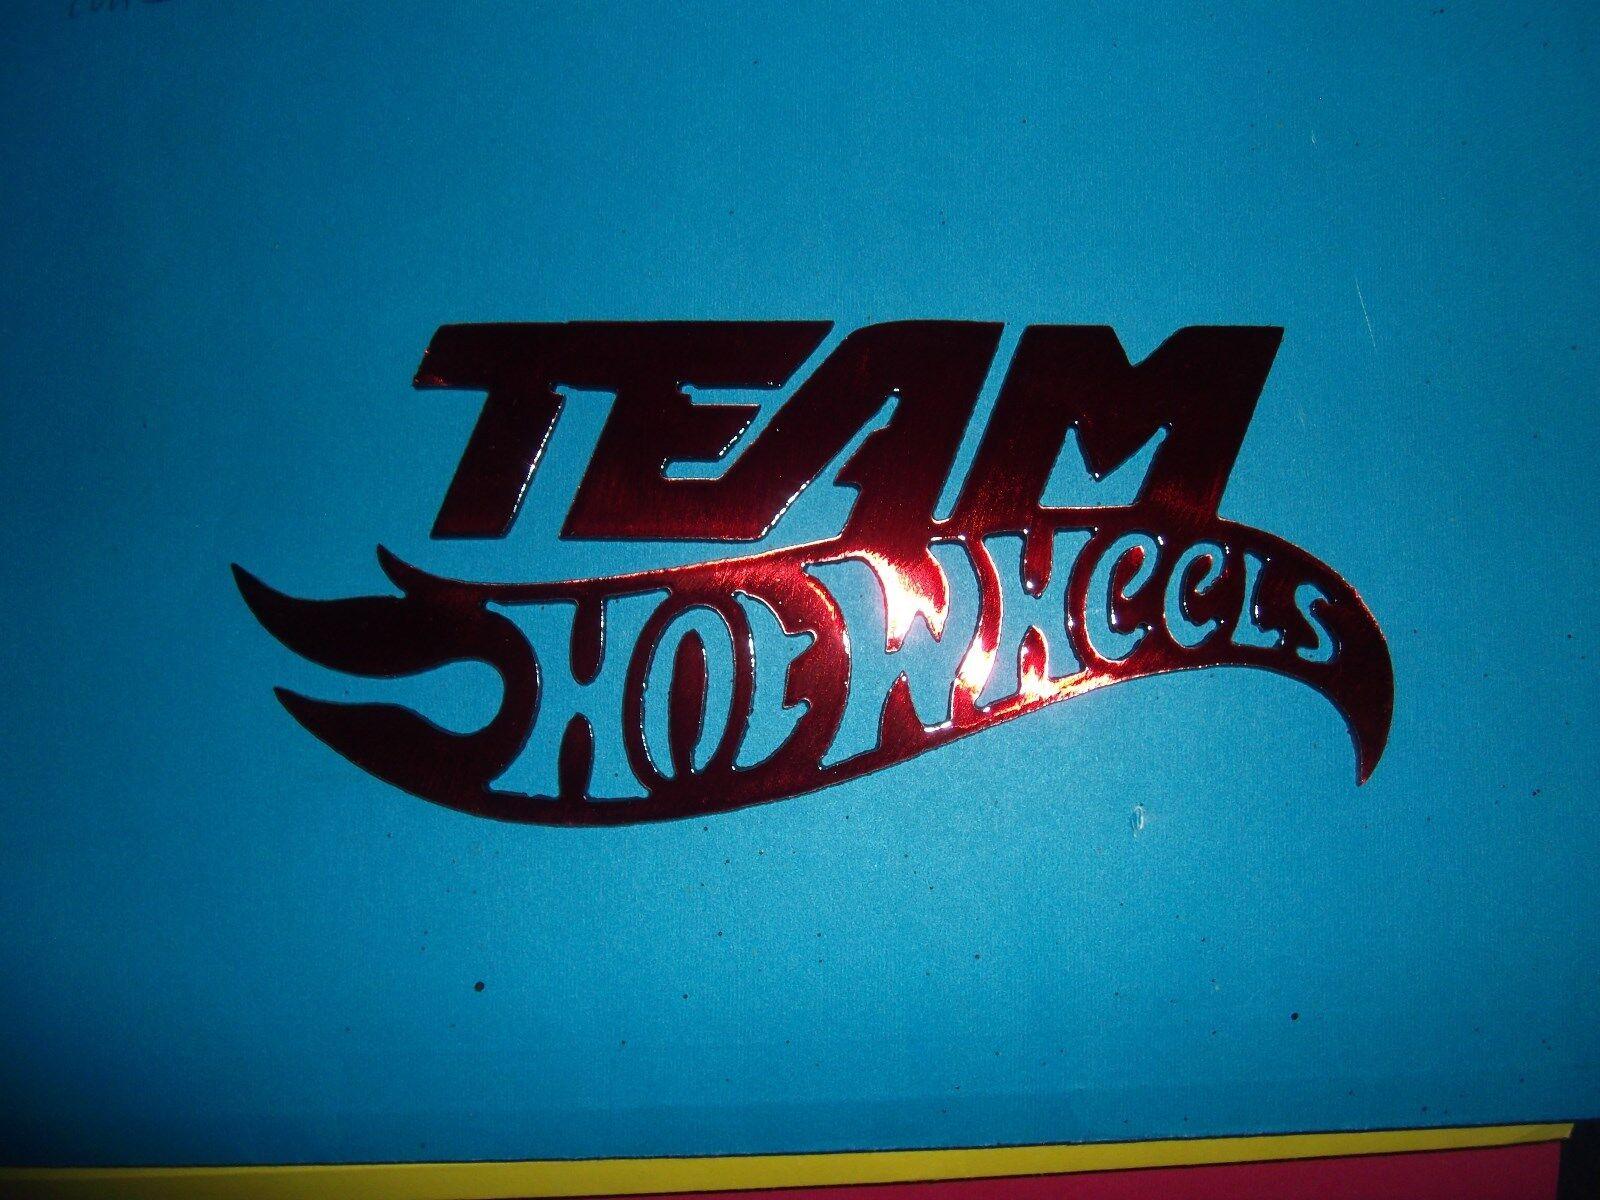 Man Cave On Wheels : Red kandy metal team hot wheels man cave garage wall decor